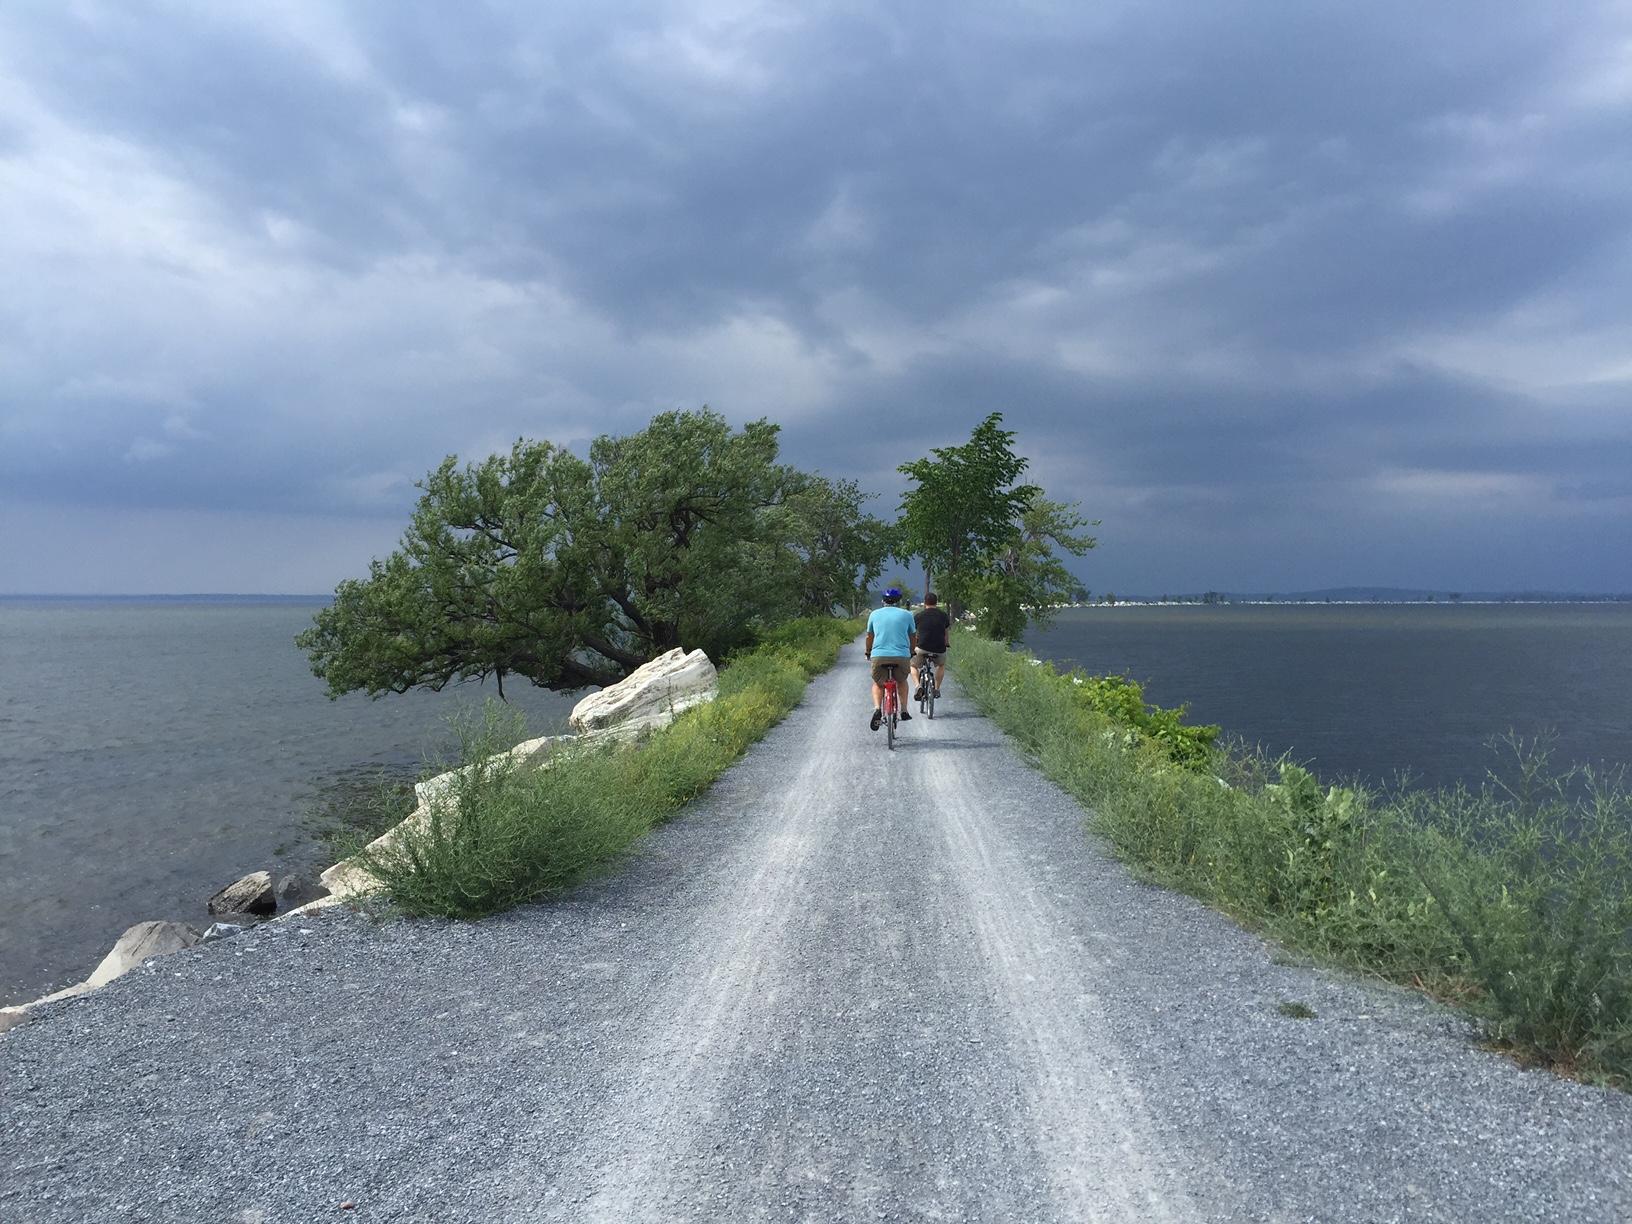 Biking to a Healthier Community